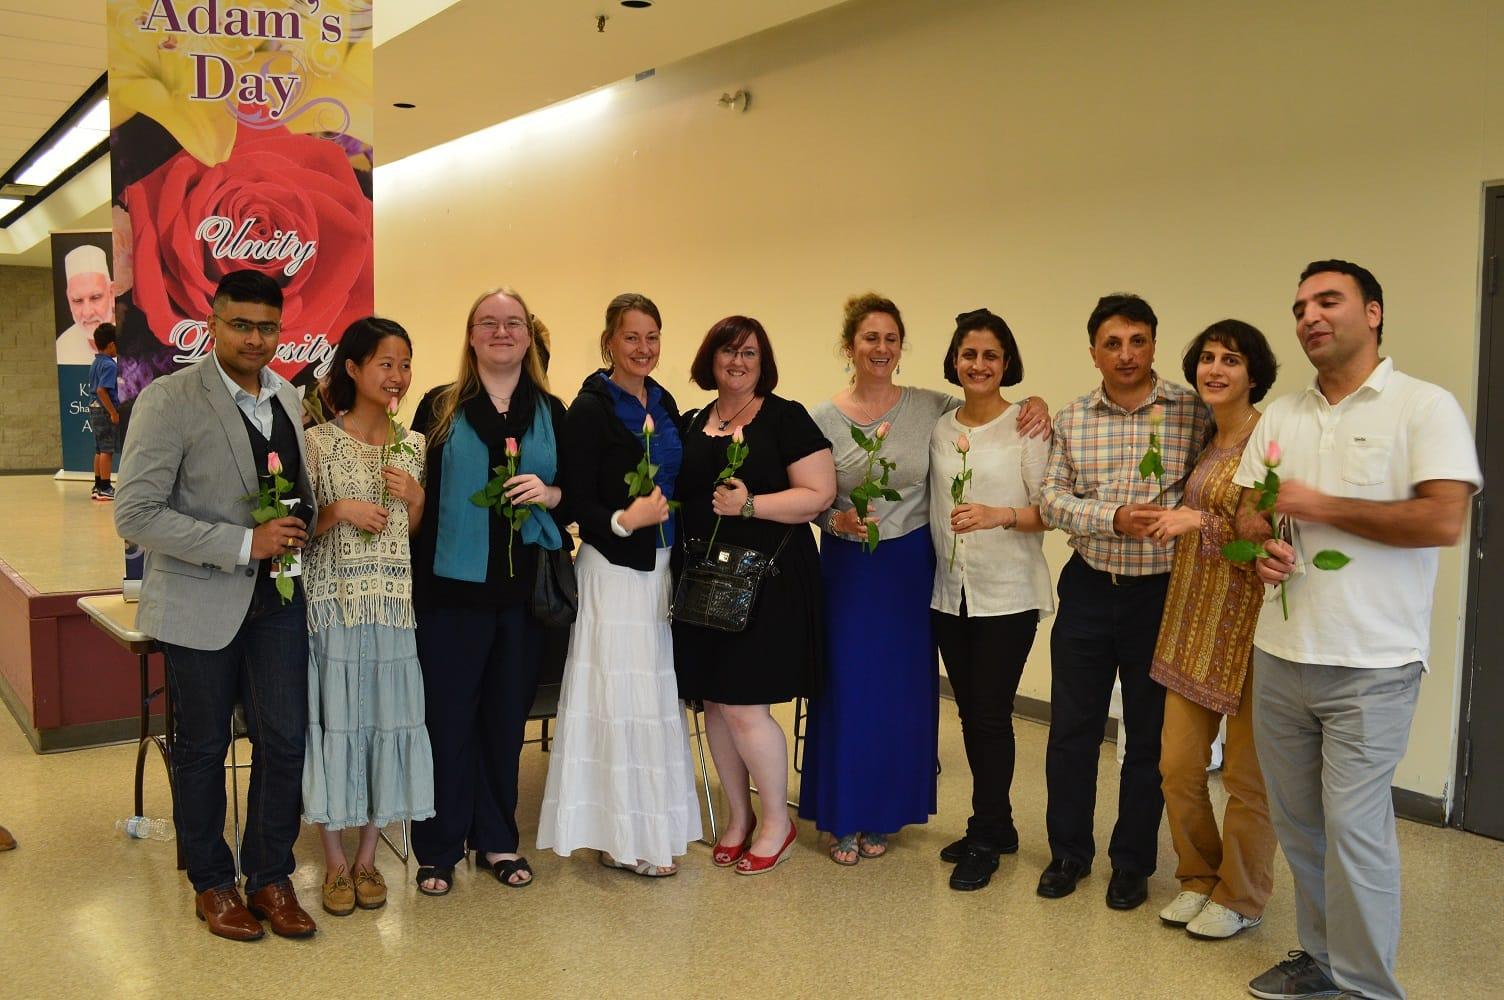 Group Photo - Sahaja Yogis at Adams Day 2014s